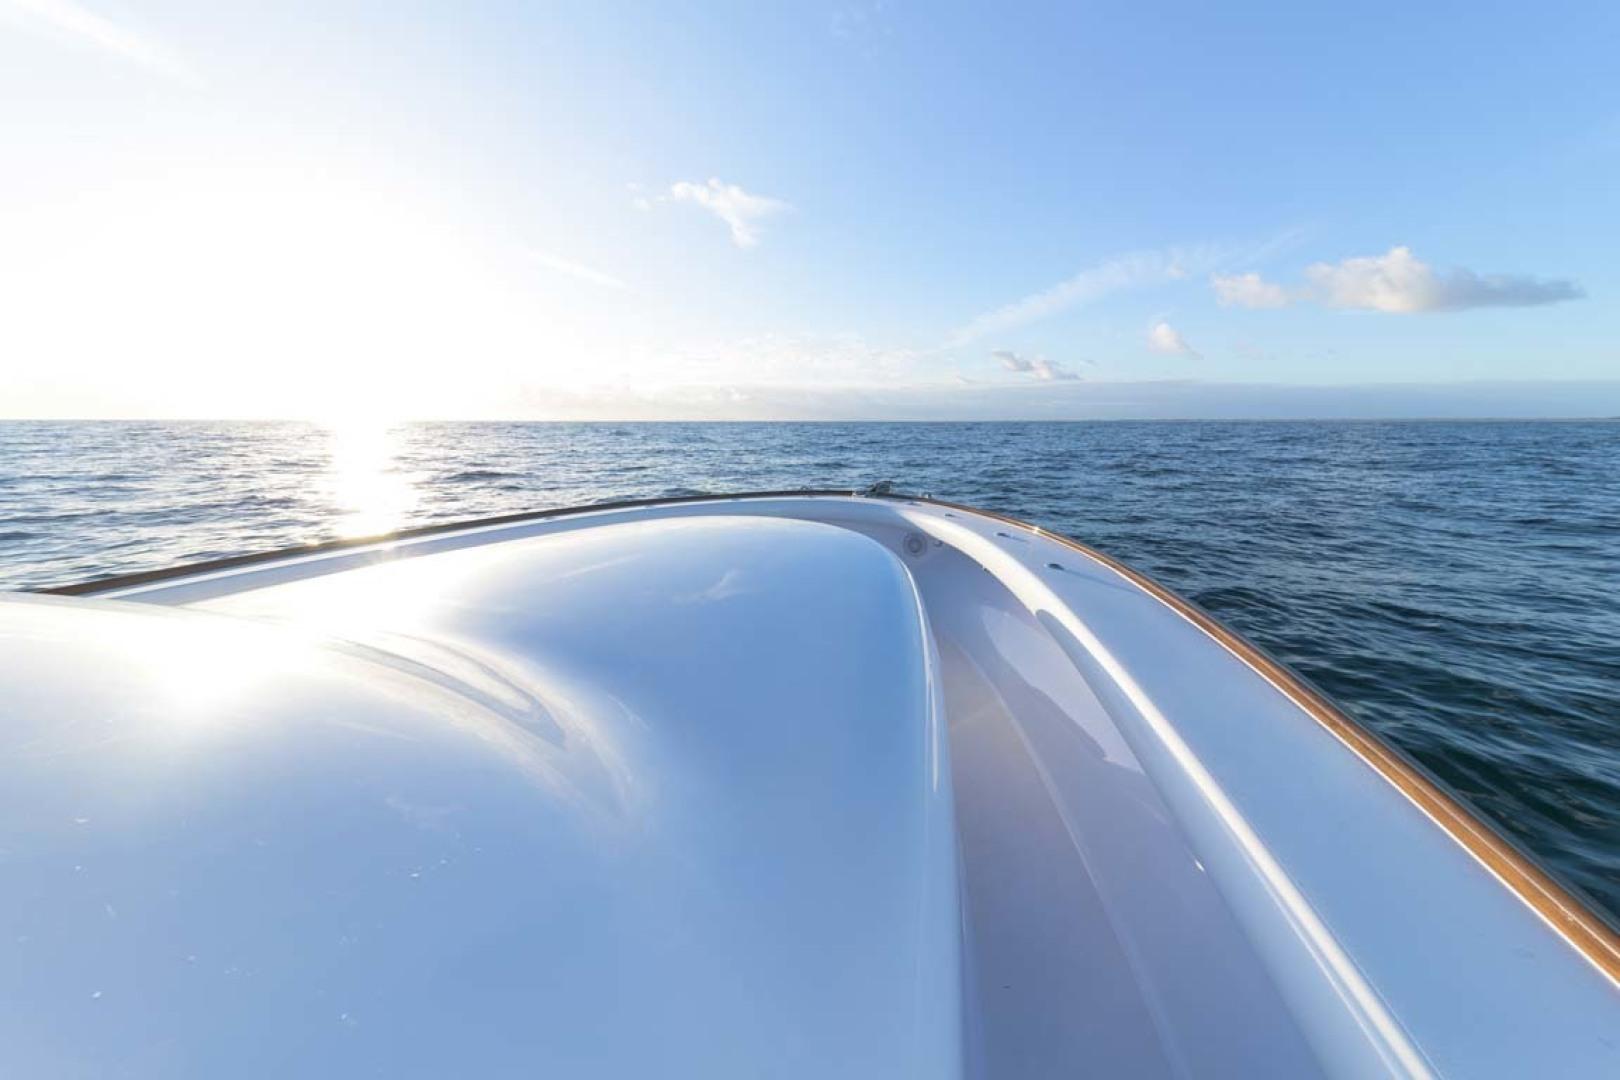 Winter Custom Yachts-46 Walkaround 2019-Family Circus Stuart-Florida-United States-Starboard Side Deck-1563732 | Thumbnail